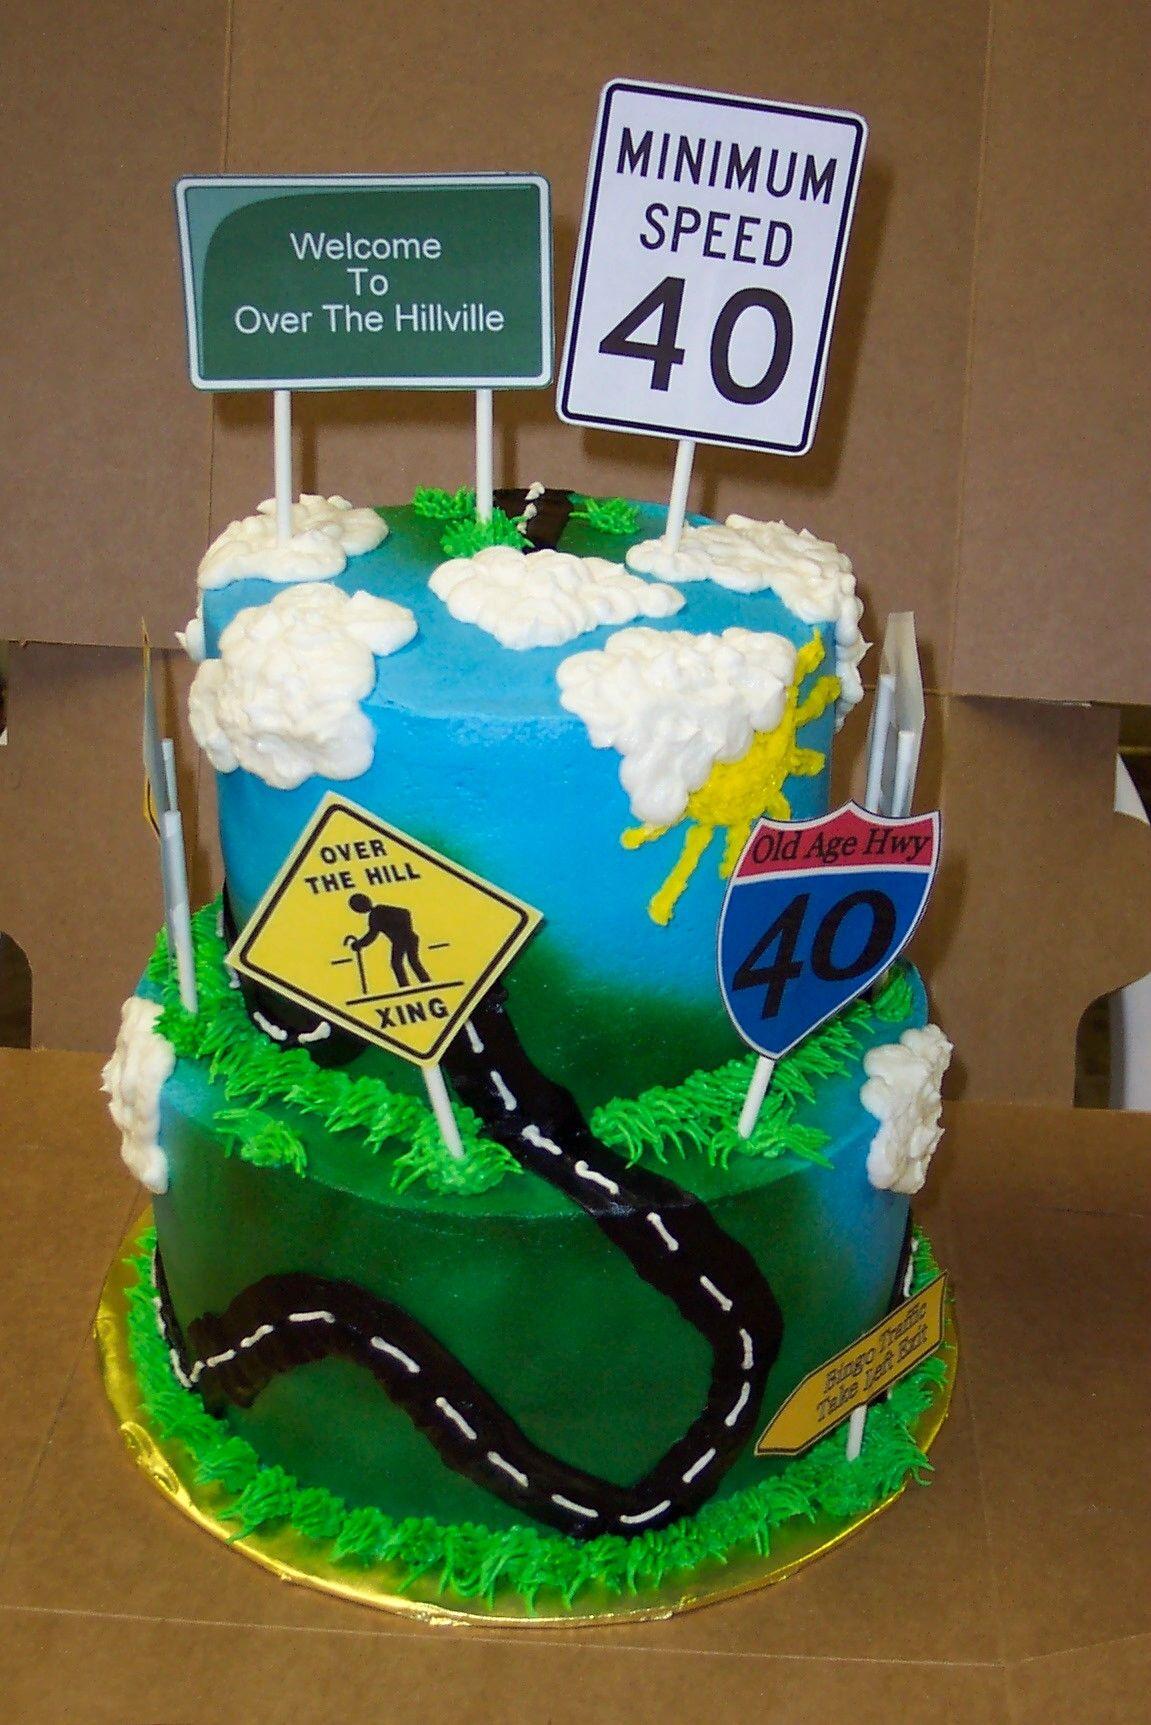 Over The Hill Cake Over The Hill Over The Hill Cakes 40th Birthday Cakes Funny Birthday Cakes